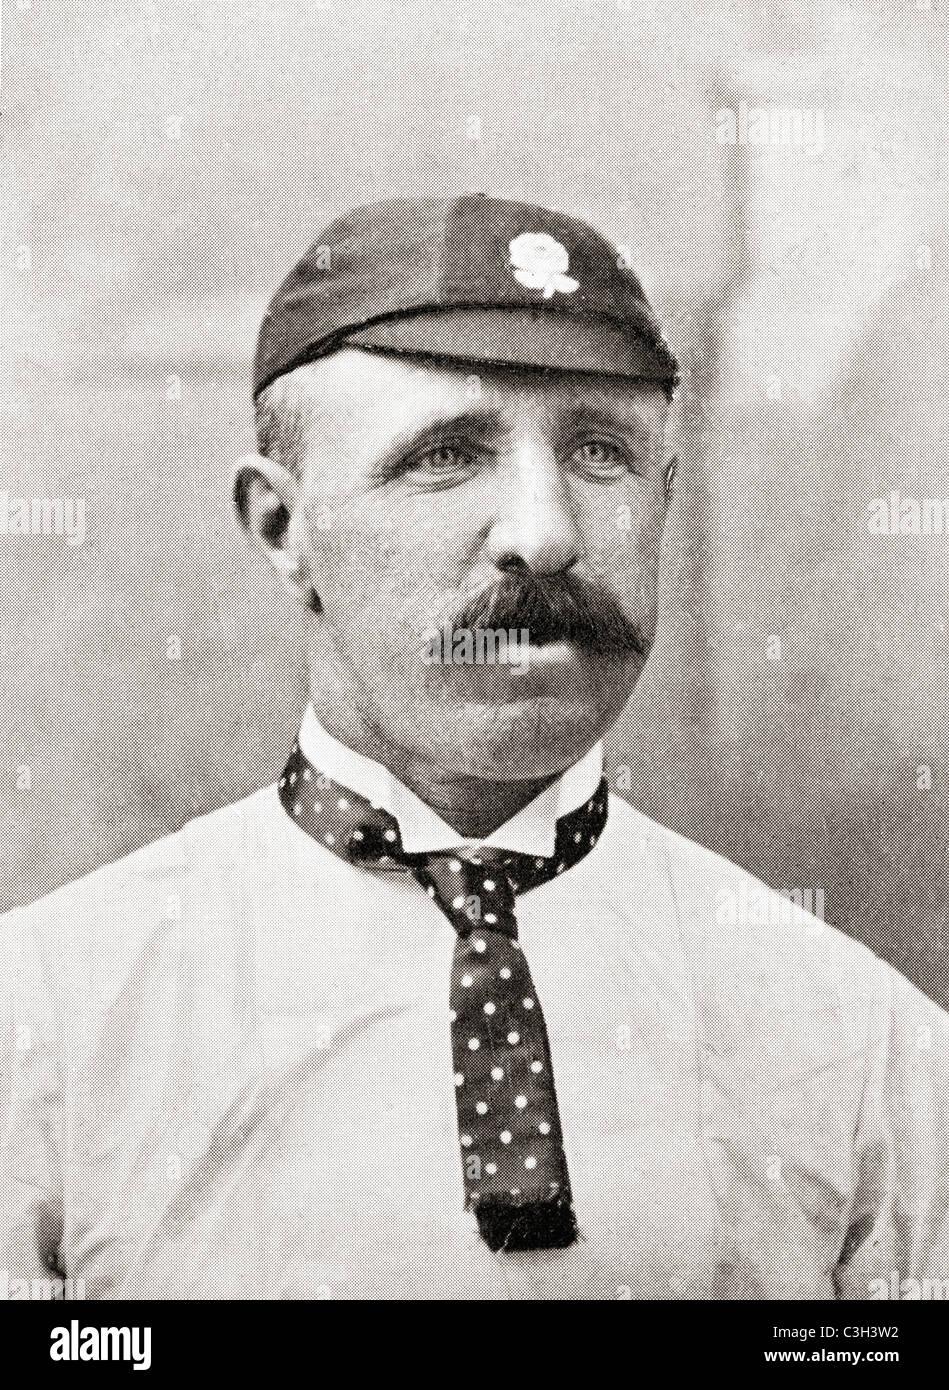 Thomas 'Tom' Emmett, 1841 – 1904. English cricket bowler. - Stock Image